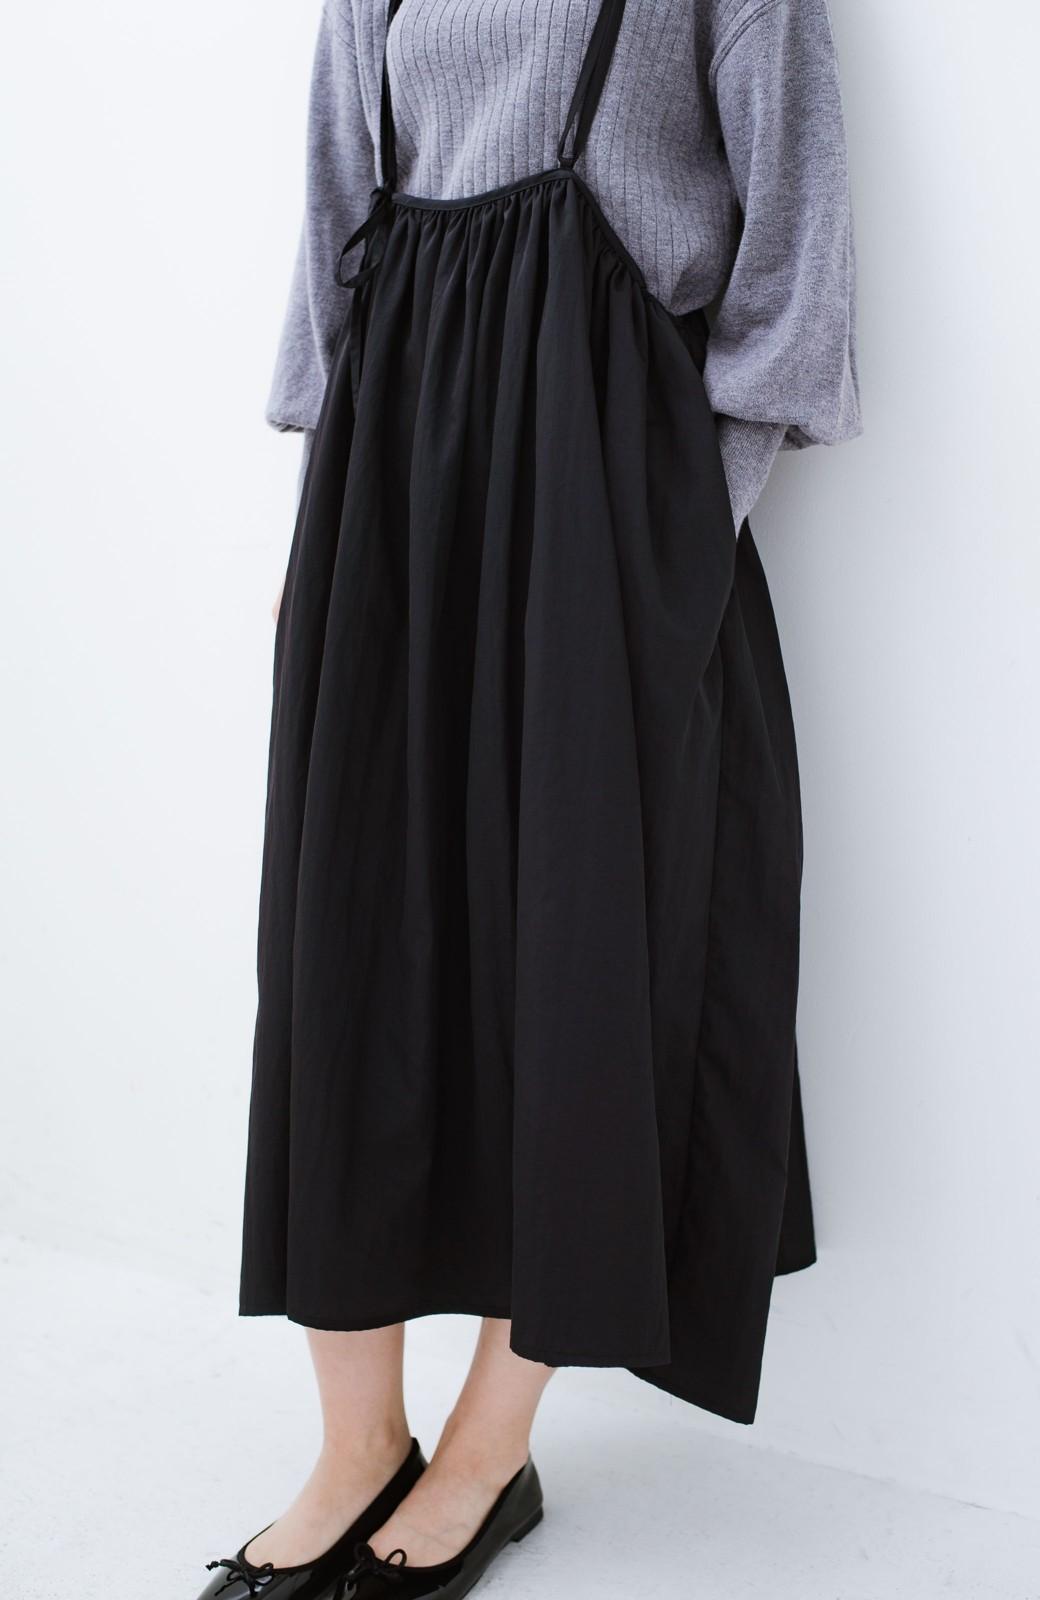 haco! 女の子バンザイ!プロジェクト【ブルー期】 ニットですら重ね着できる安心さ ゆったりギャザーキャミワンピ <ブラック>の商品写真3